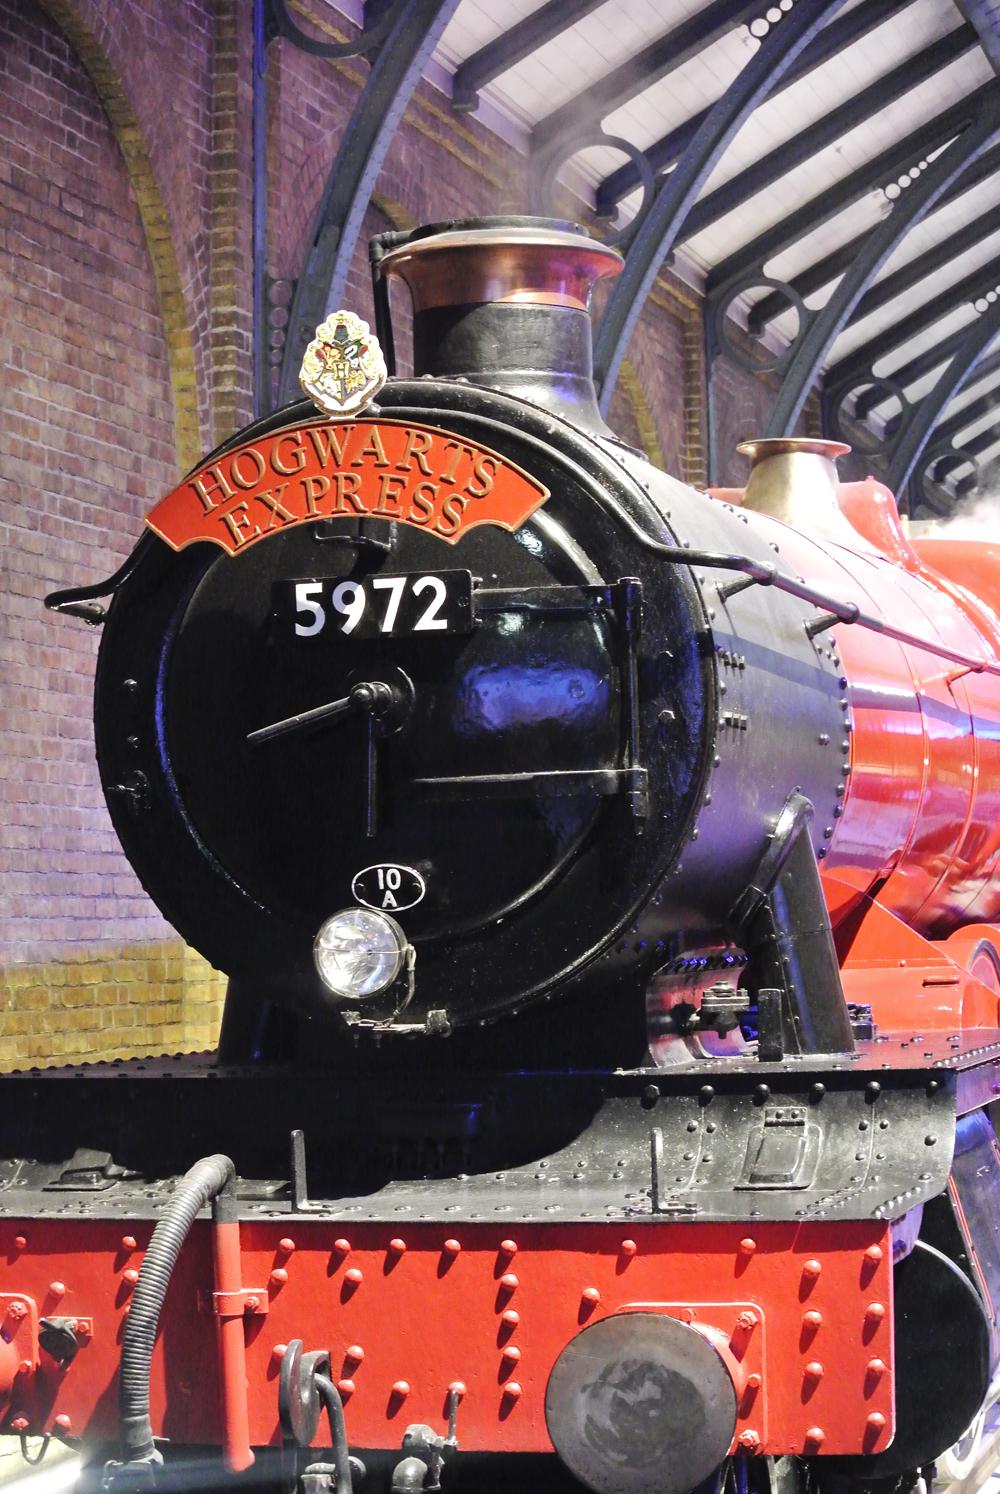 Warner Bros Studio Tour The Making of Harry Potter - Hogwarts Express